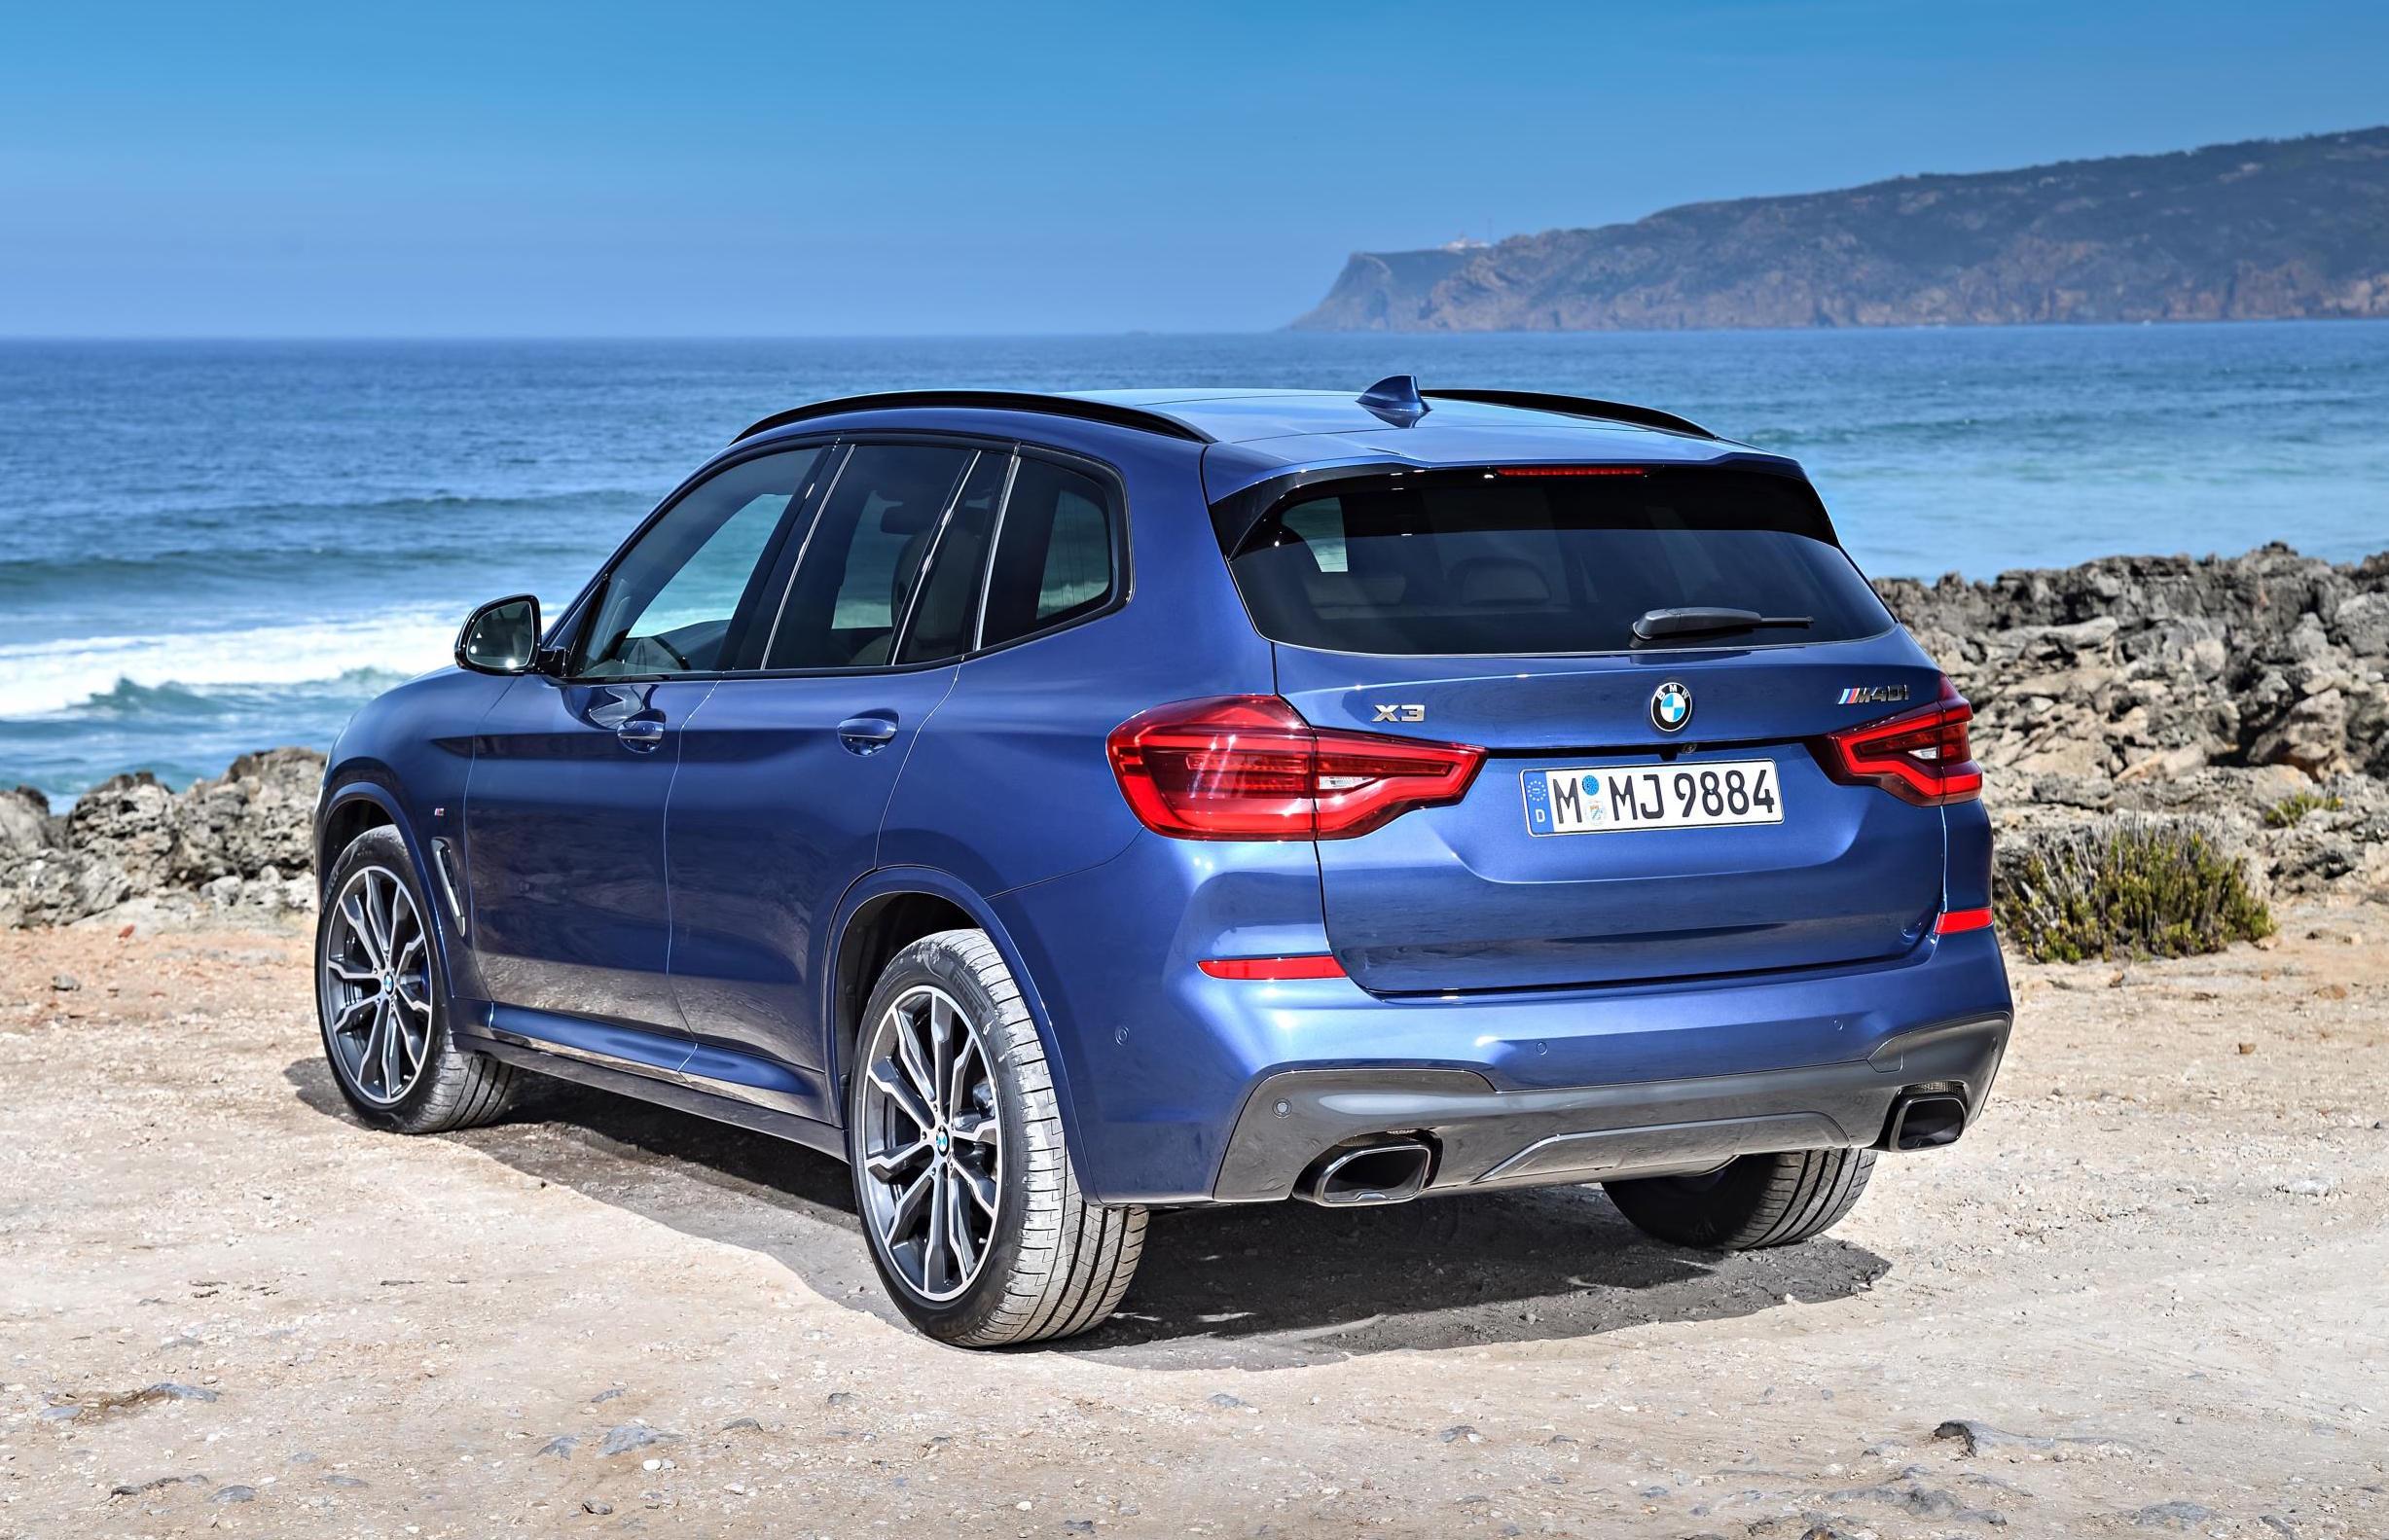 Mazda X3 2017 >> 2018 BMW X3 M40i-rear